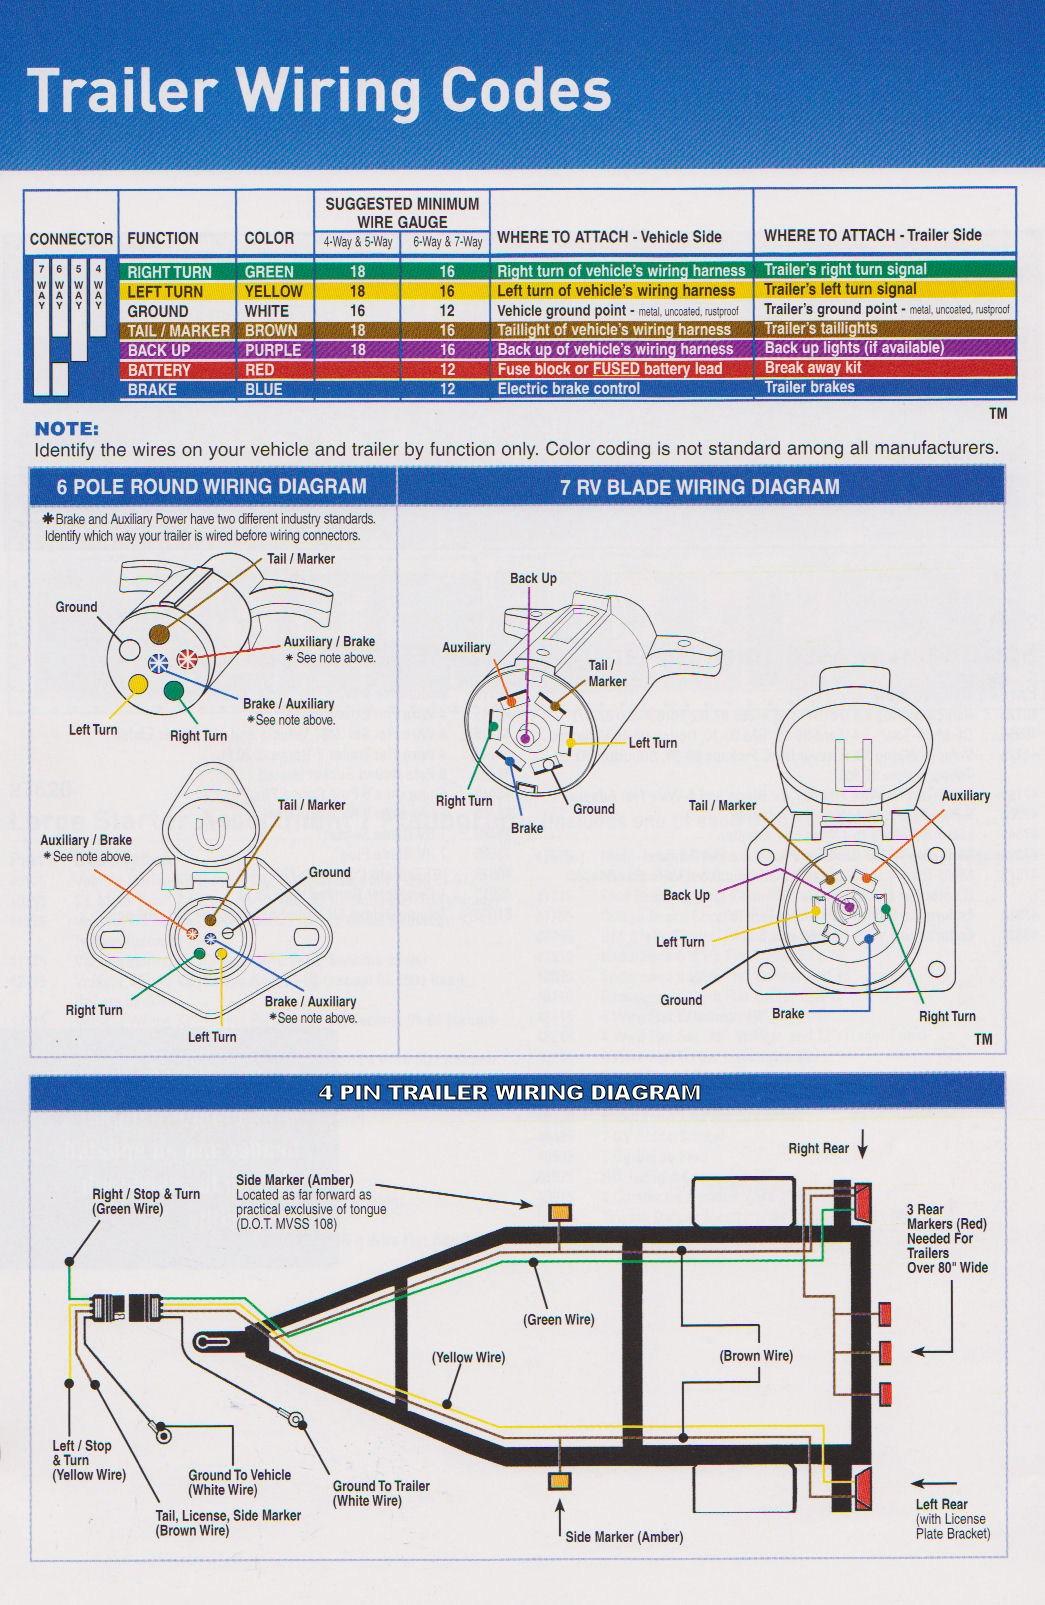 ck_4108] aluma trailer wiring diagram download diagram  ittab xorcede mepta mohammedshrine librar wiring 101